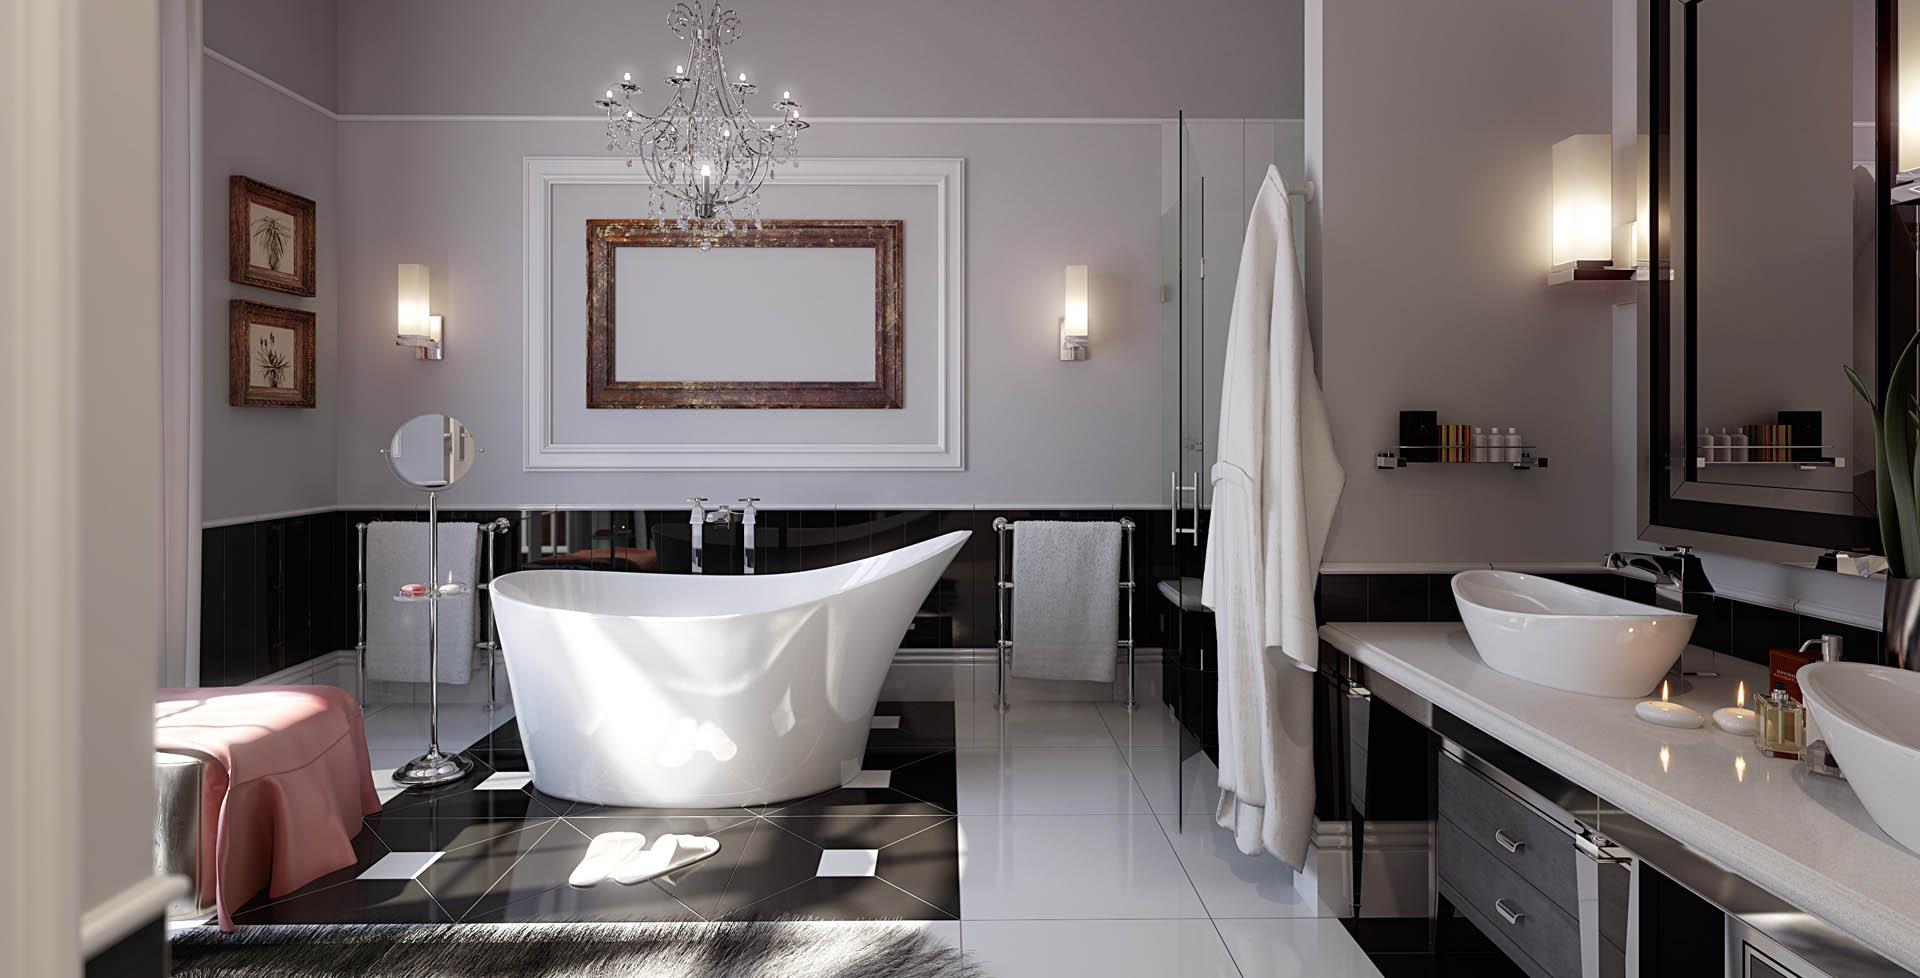 Showers  Wet rooms  Tiles  - The Bathroom Boutique Dublin South